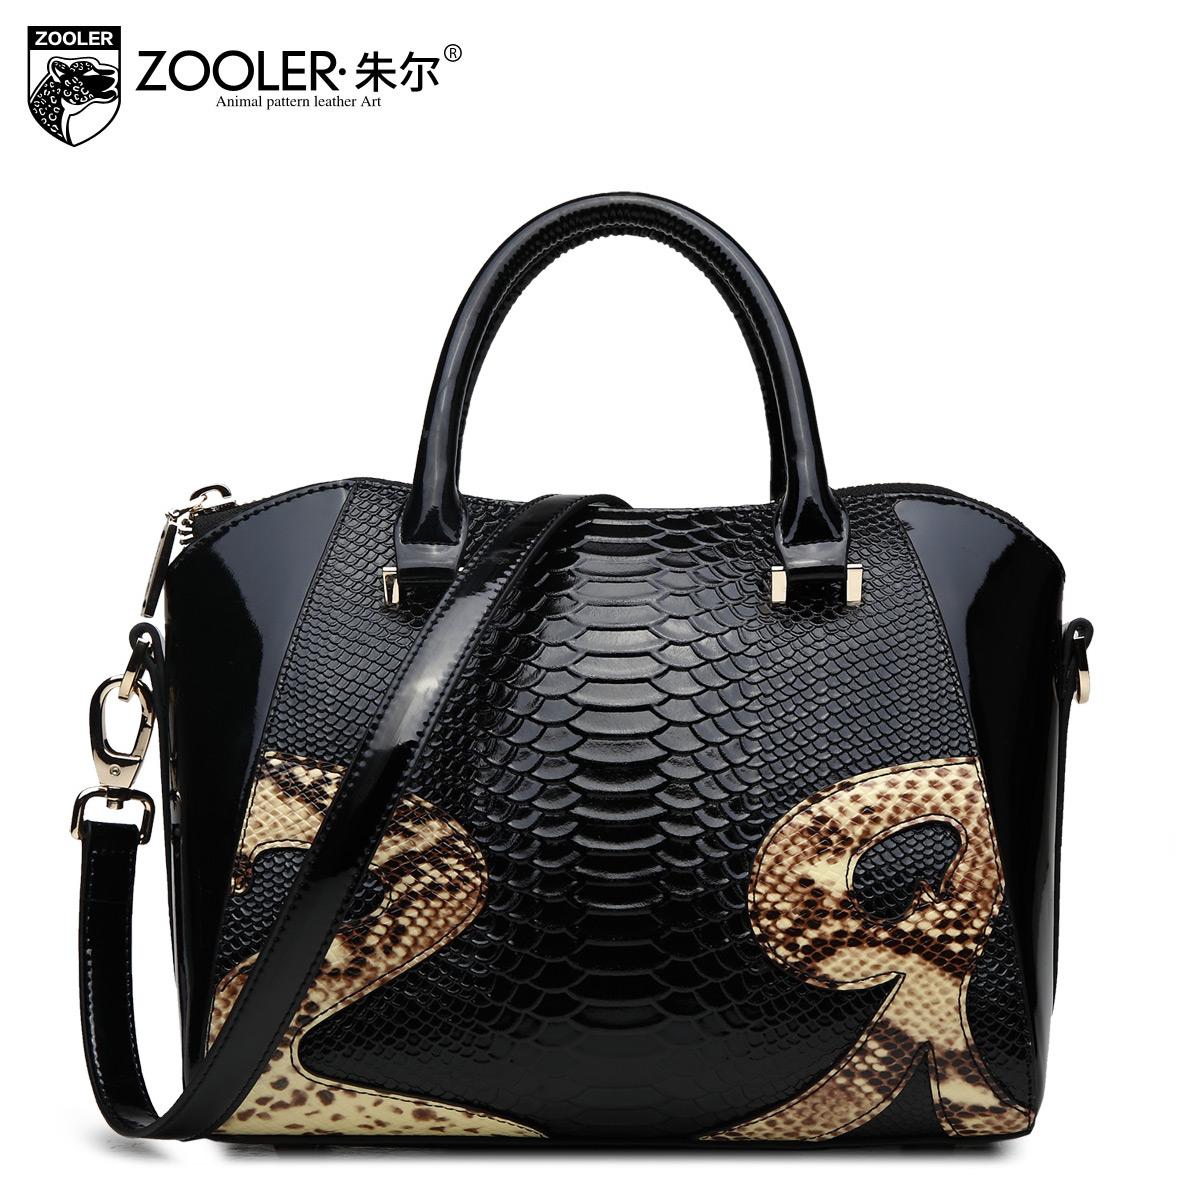 Autumn and winter women's cowhide handbag 2015 fashion serpentine pattern women's bucket bag handbag female